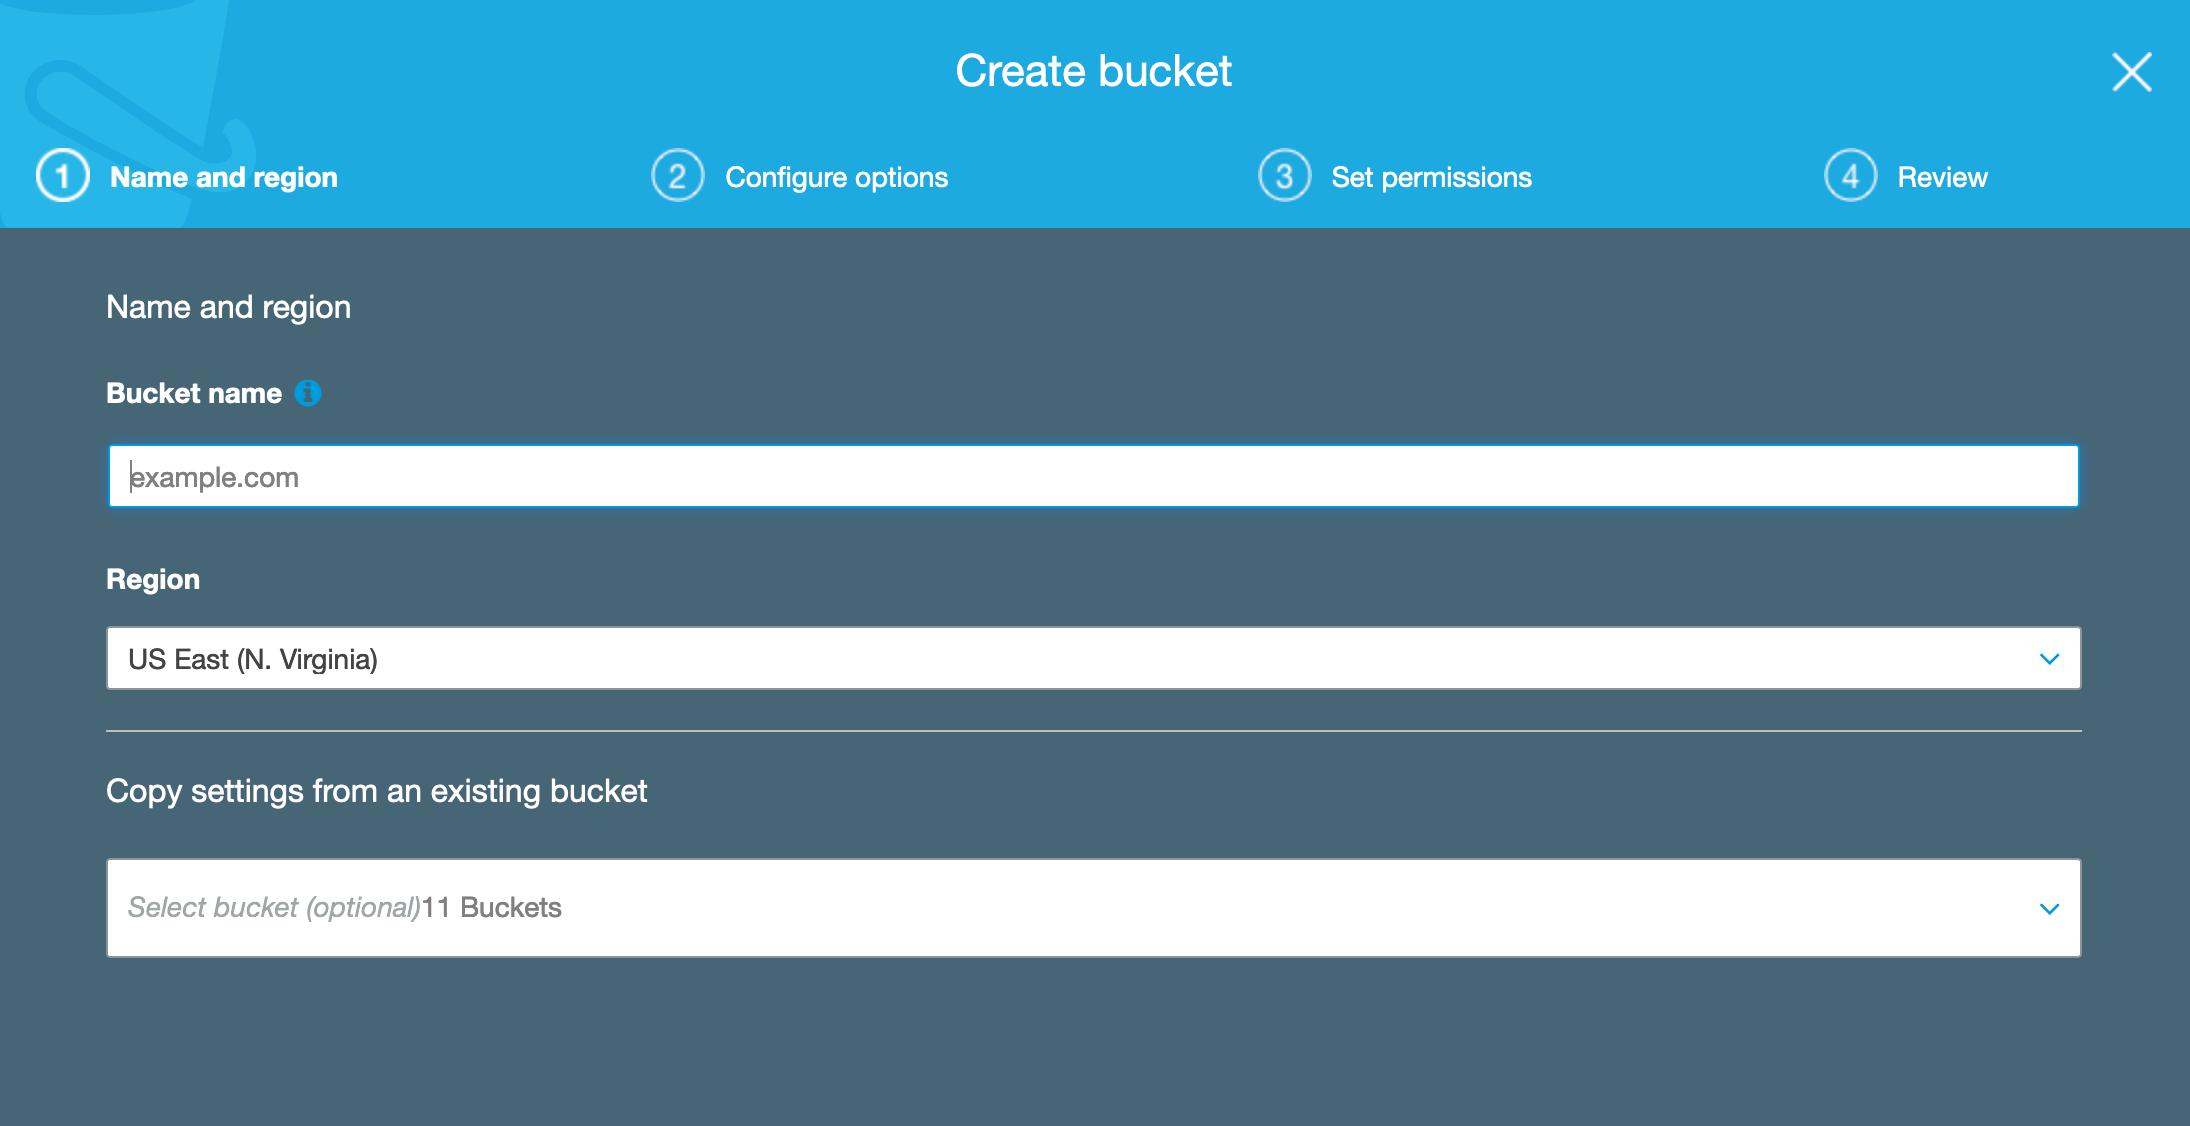 Second bucket creation